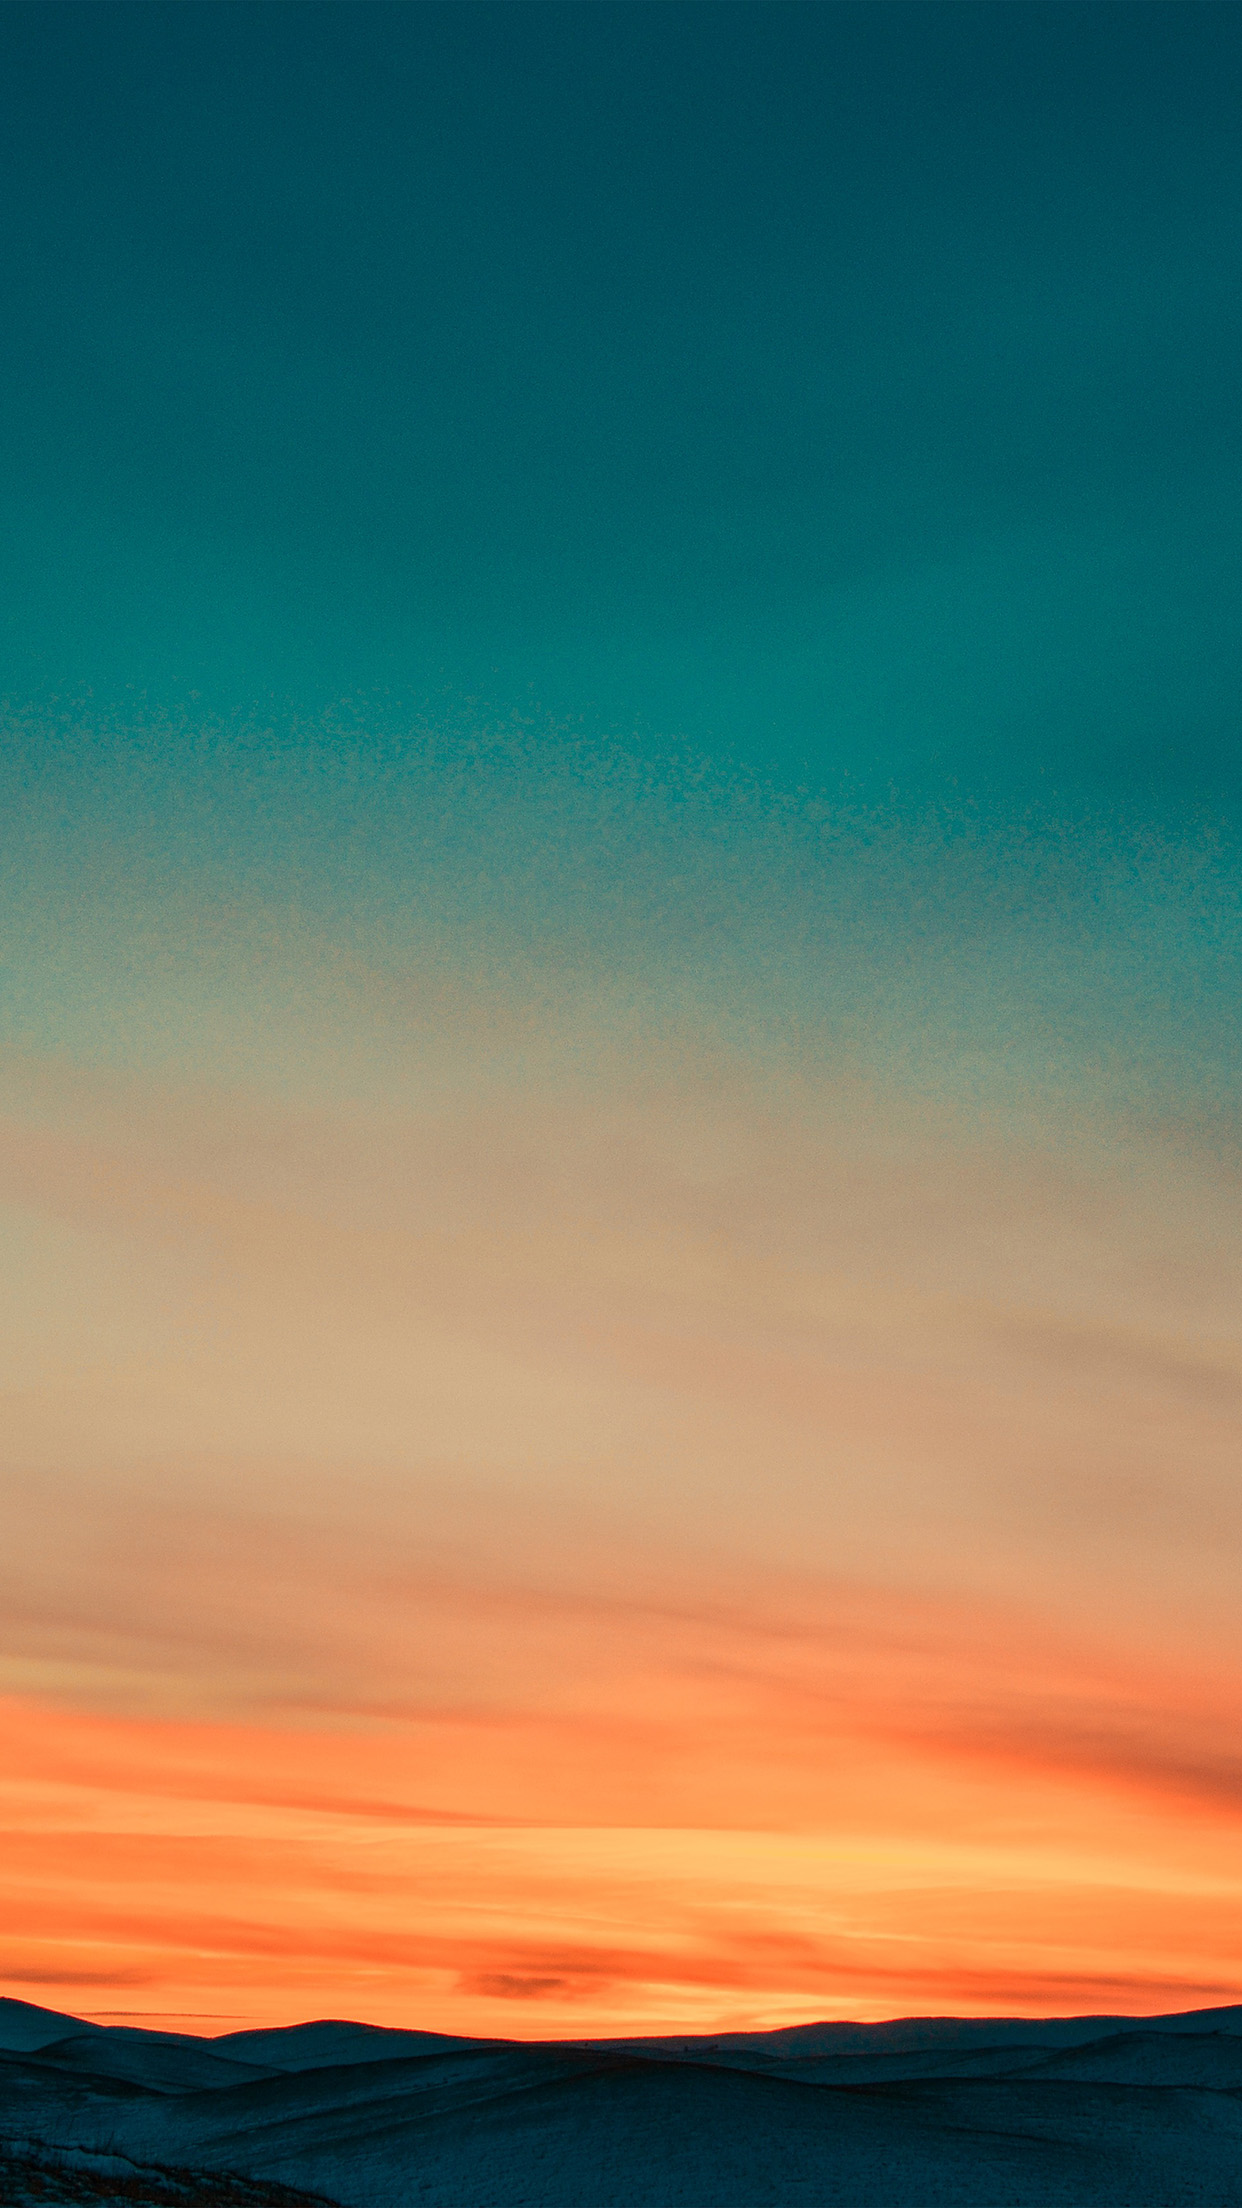 sunset wallpaper iphone